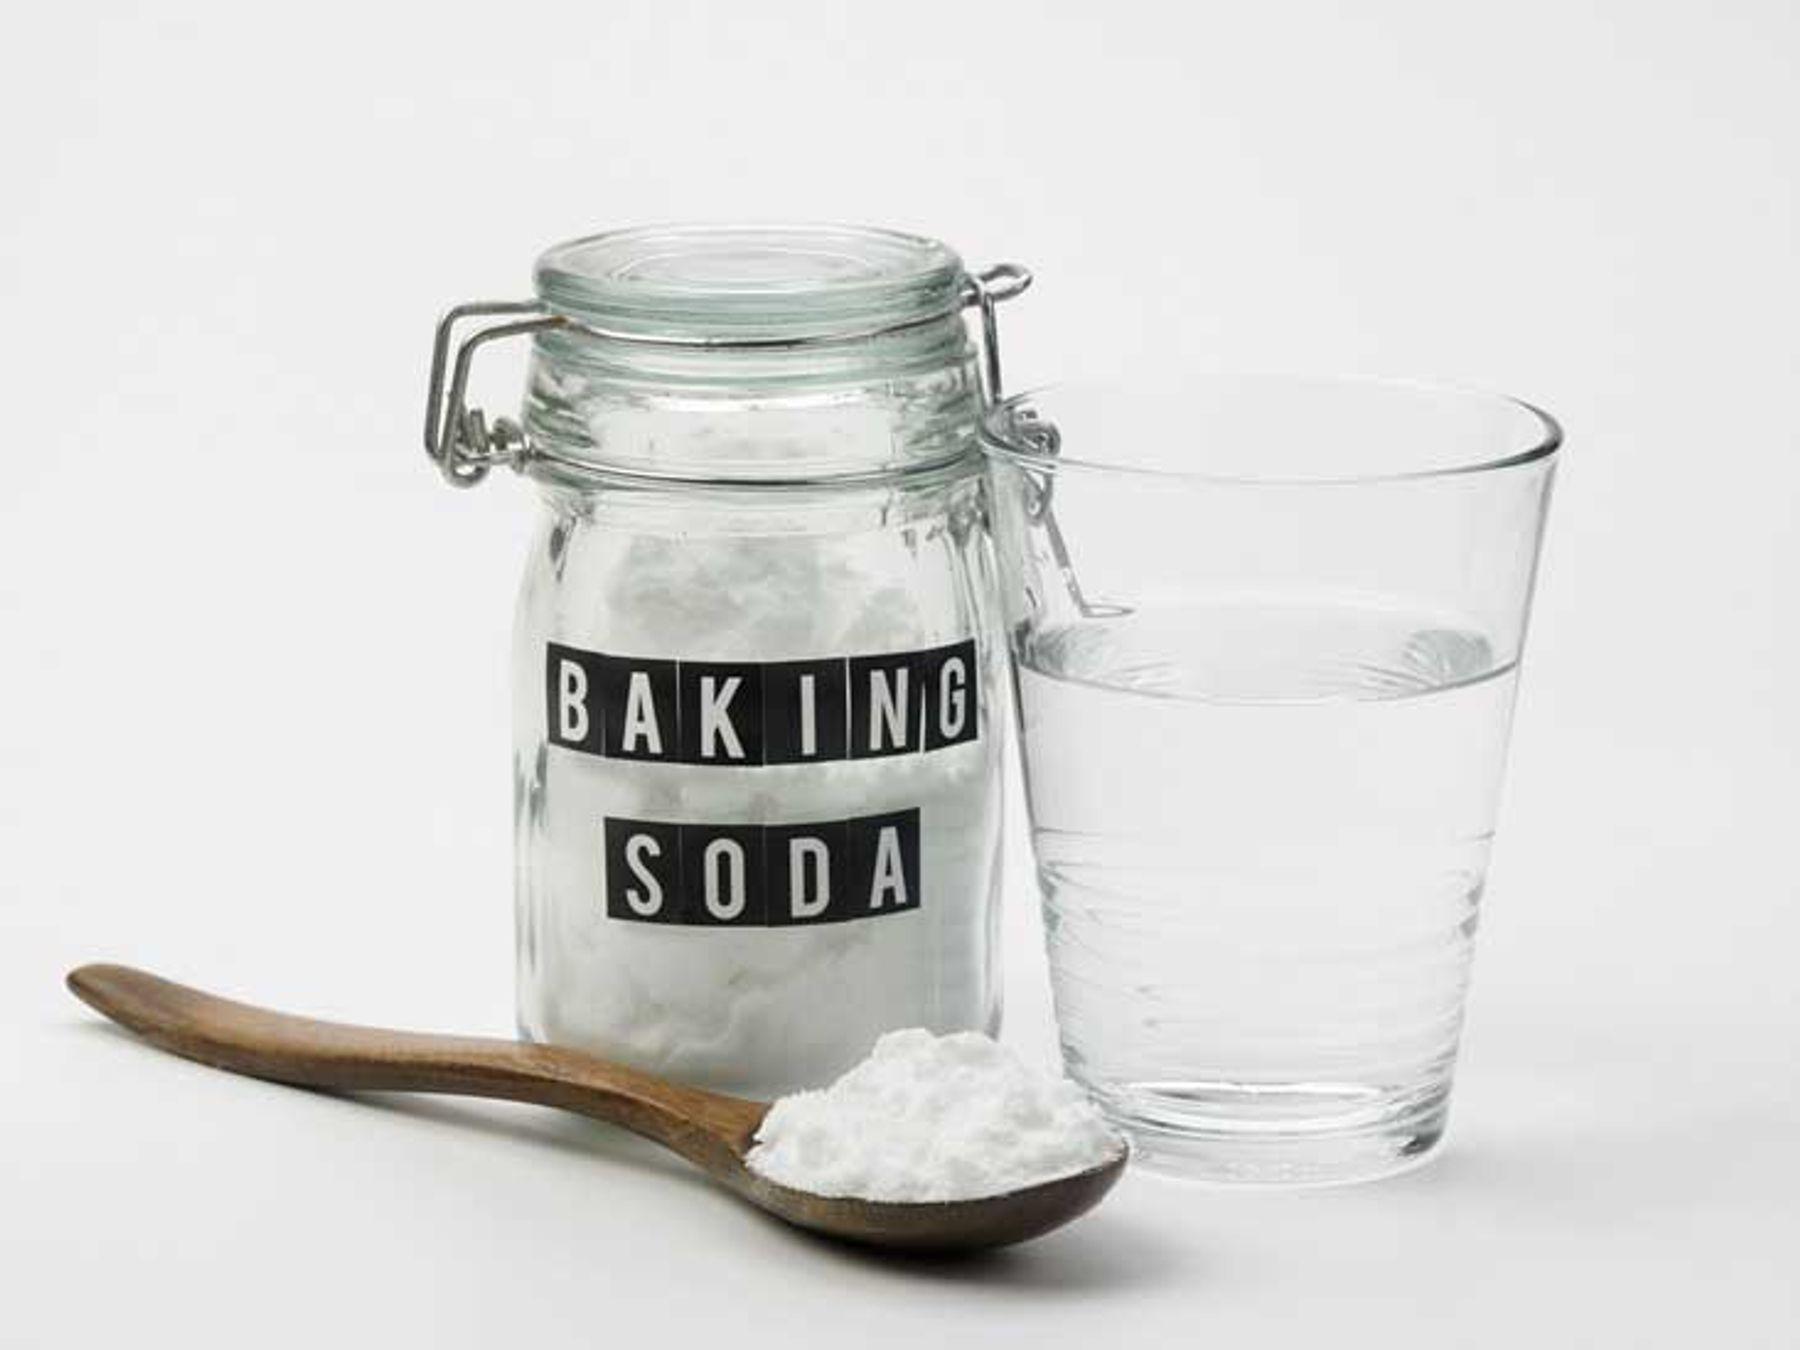 Sử dụng Baking Soda để xử lý ruột gối bị mốc